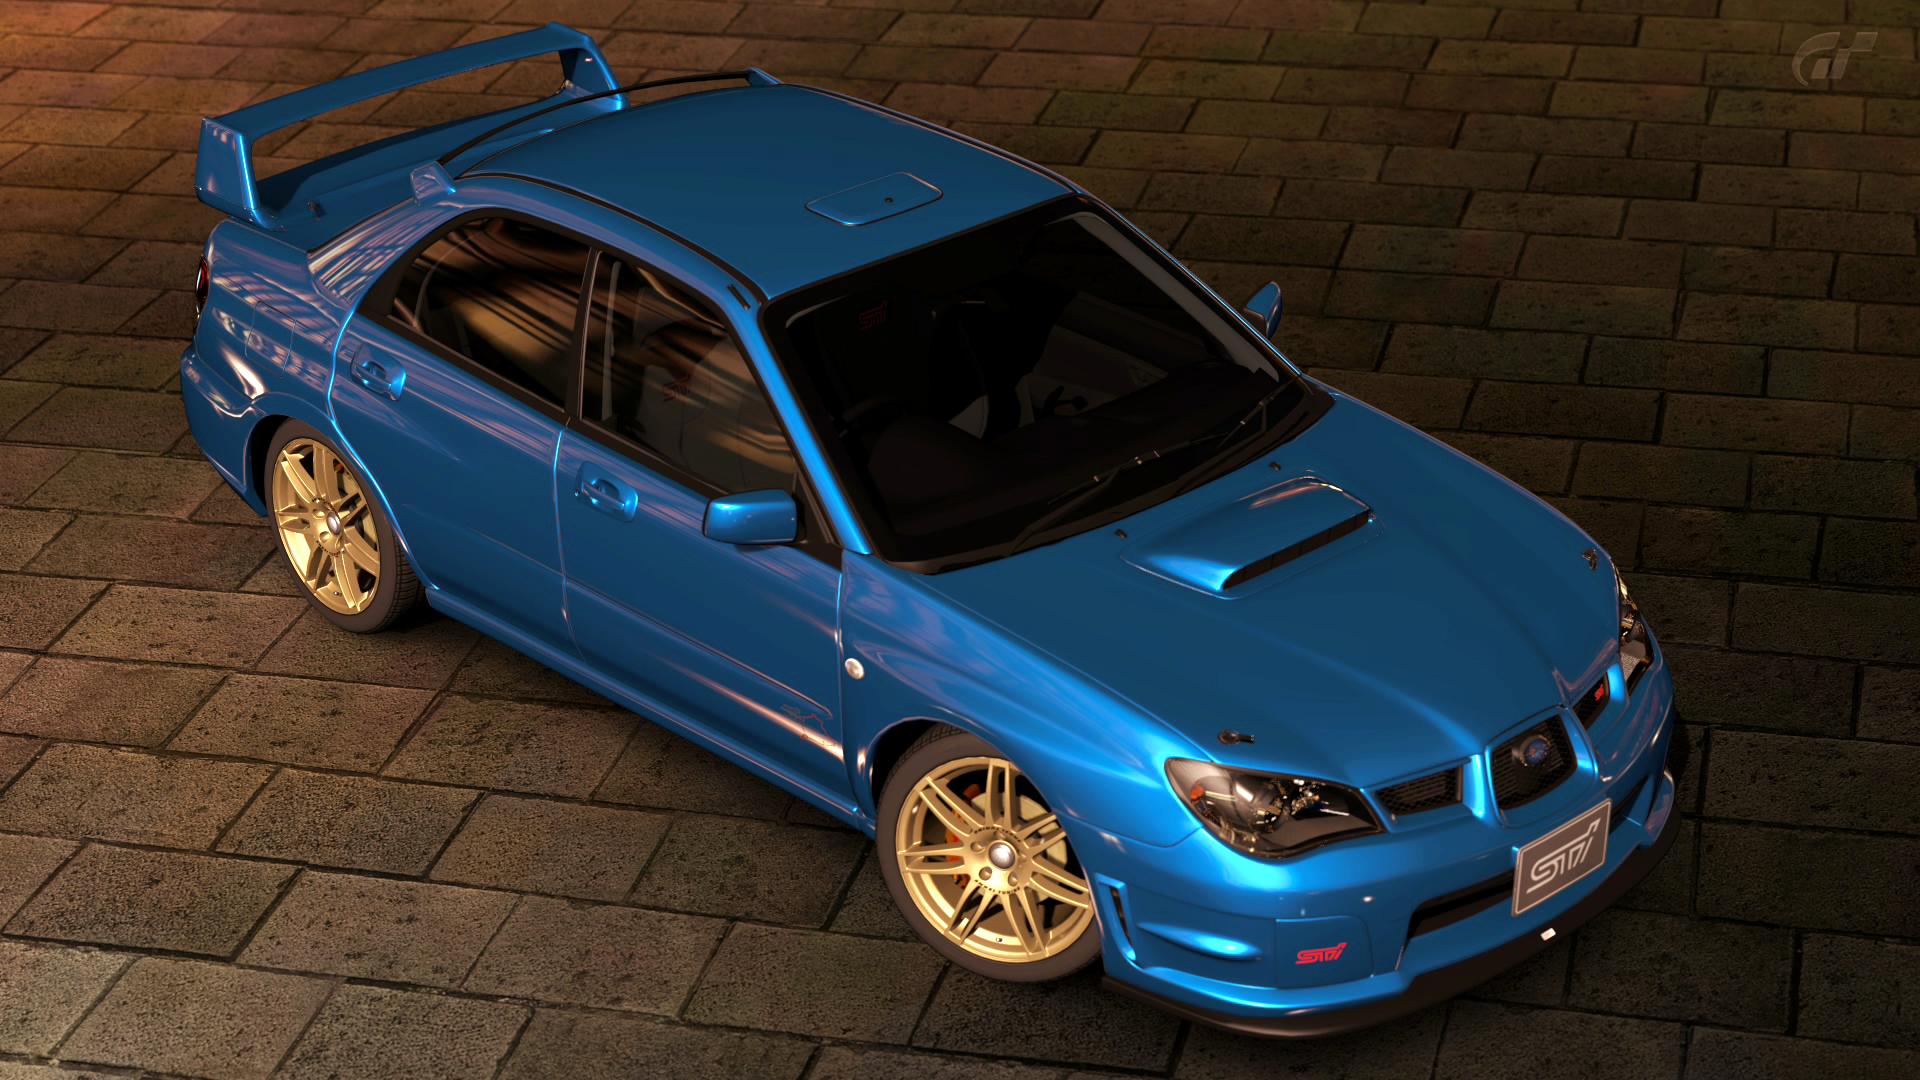 2005 Subaru Impreza WRX STI SpecC Type RA GT5 by Vertualissimo